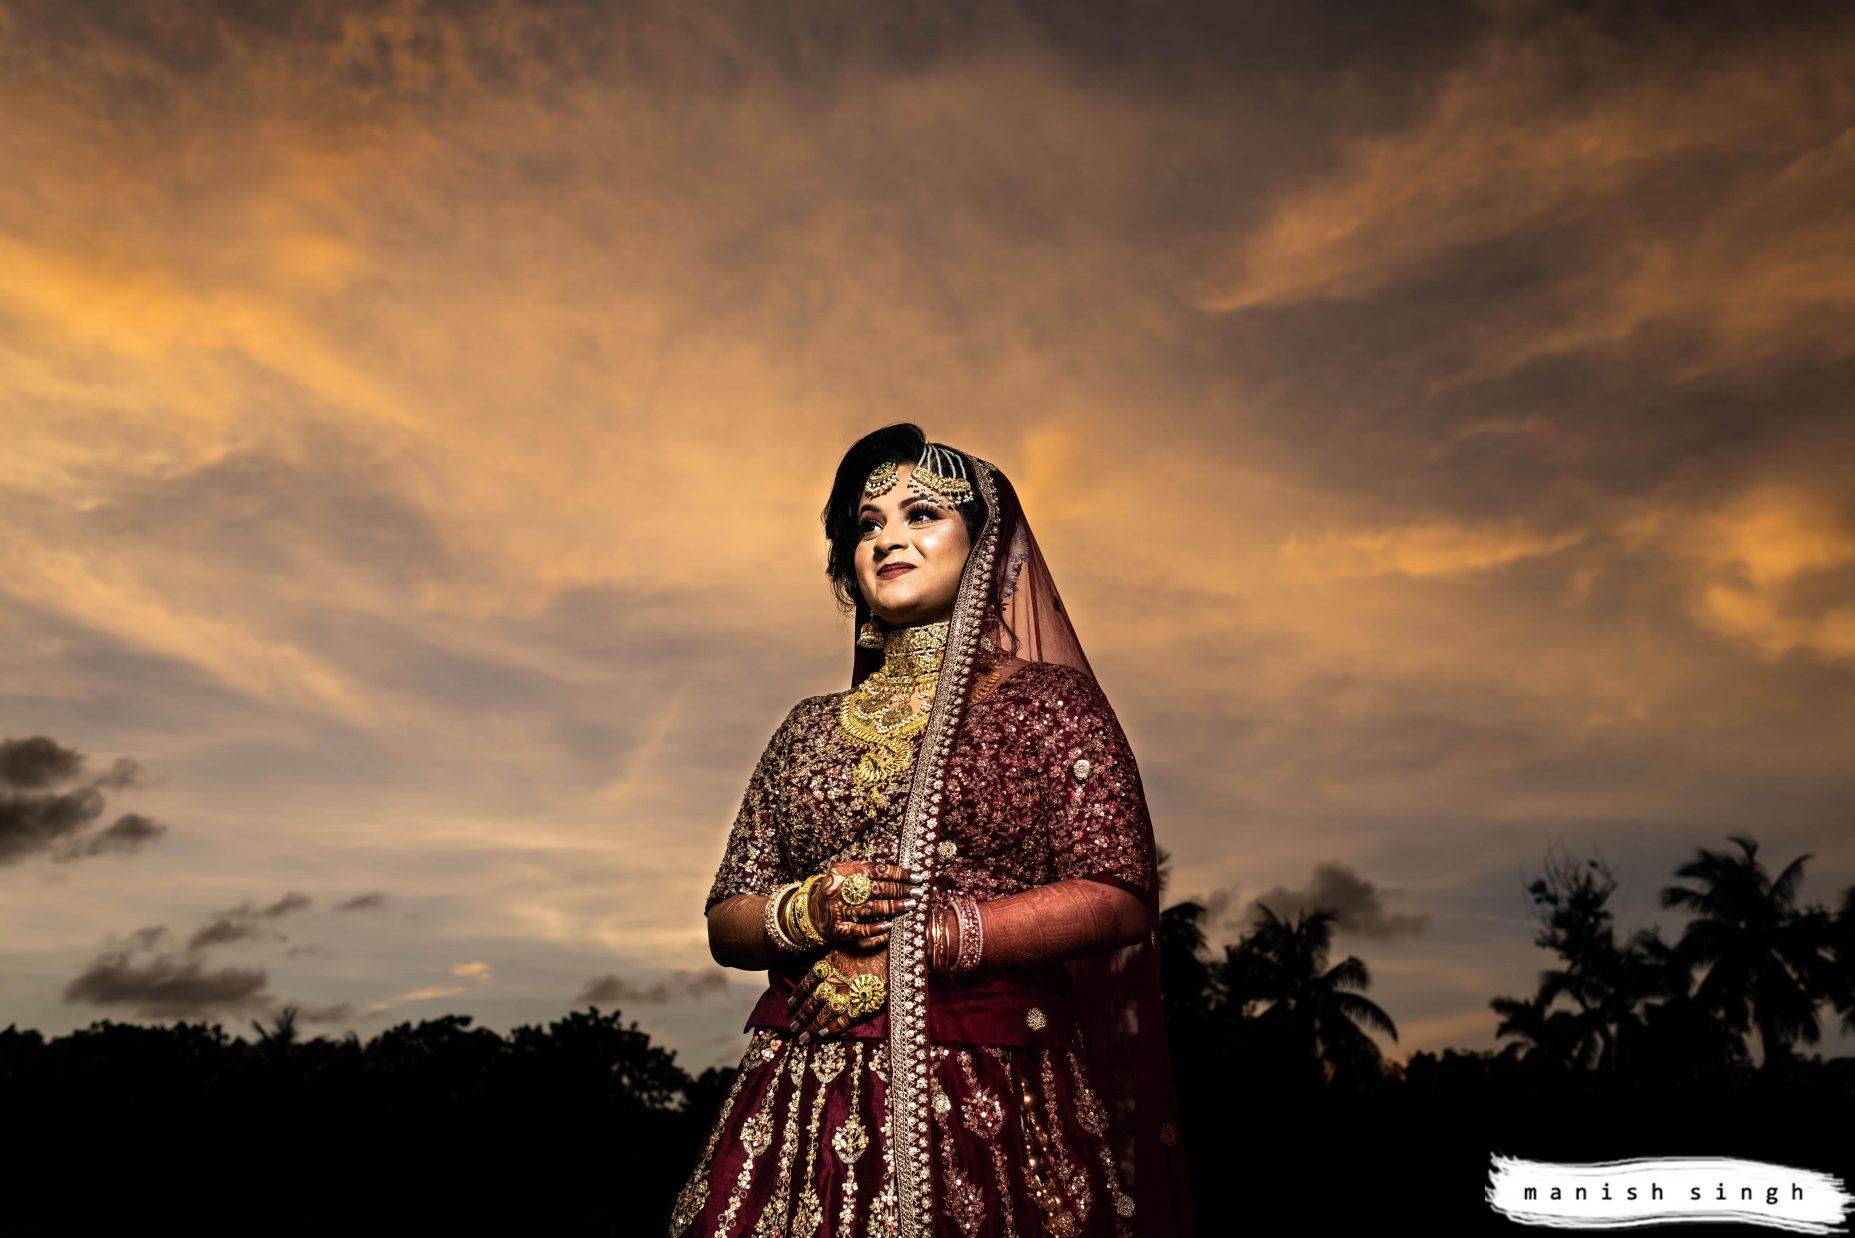 Manish Singh Photography Best wedding photography bhubaneswar-10491